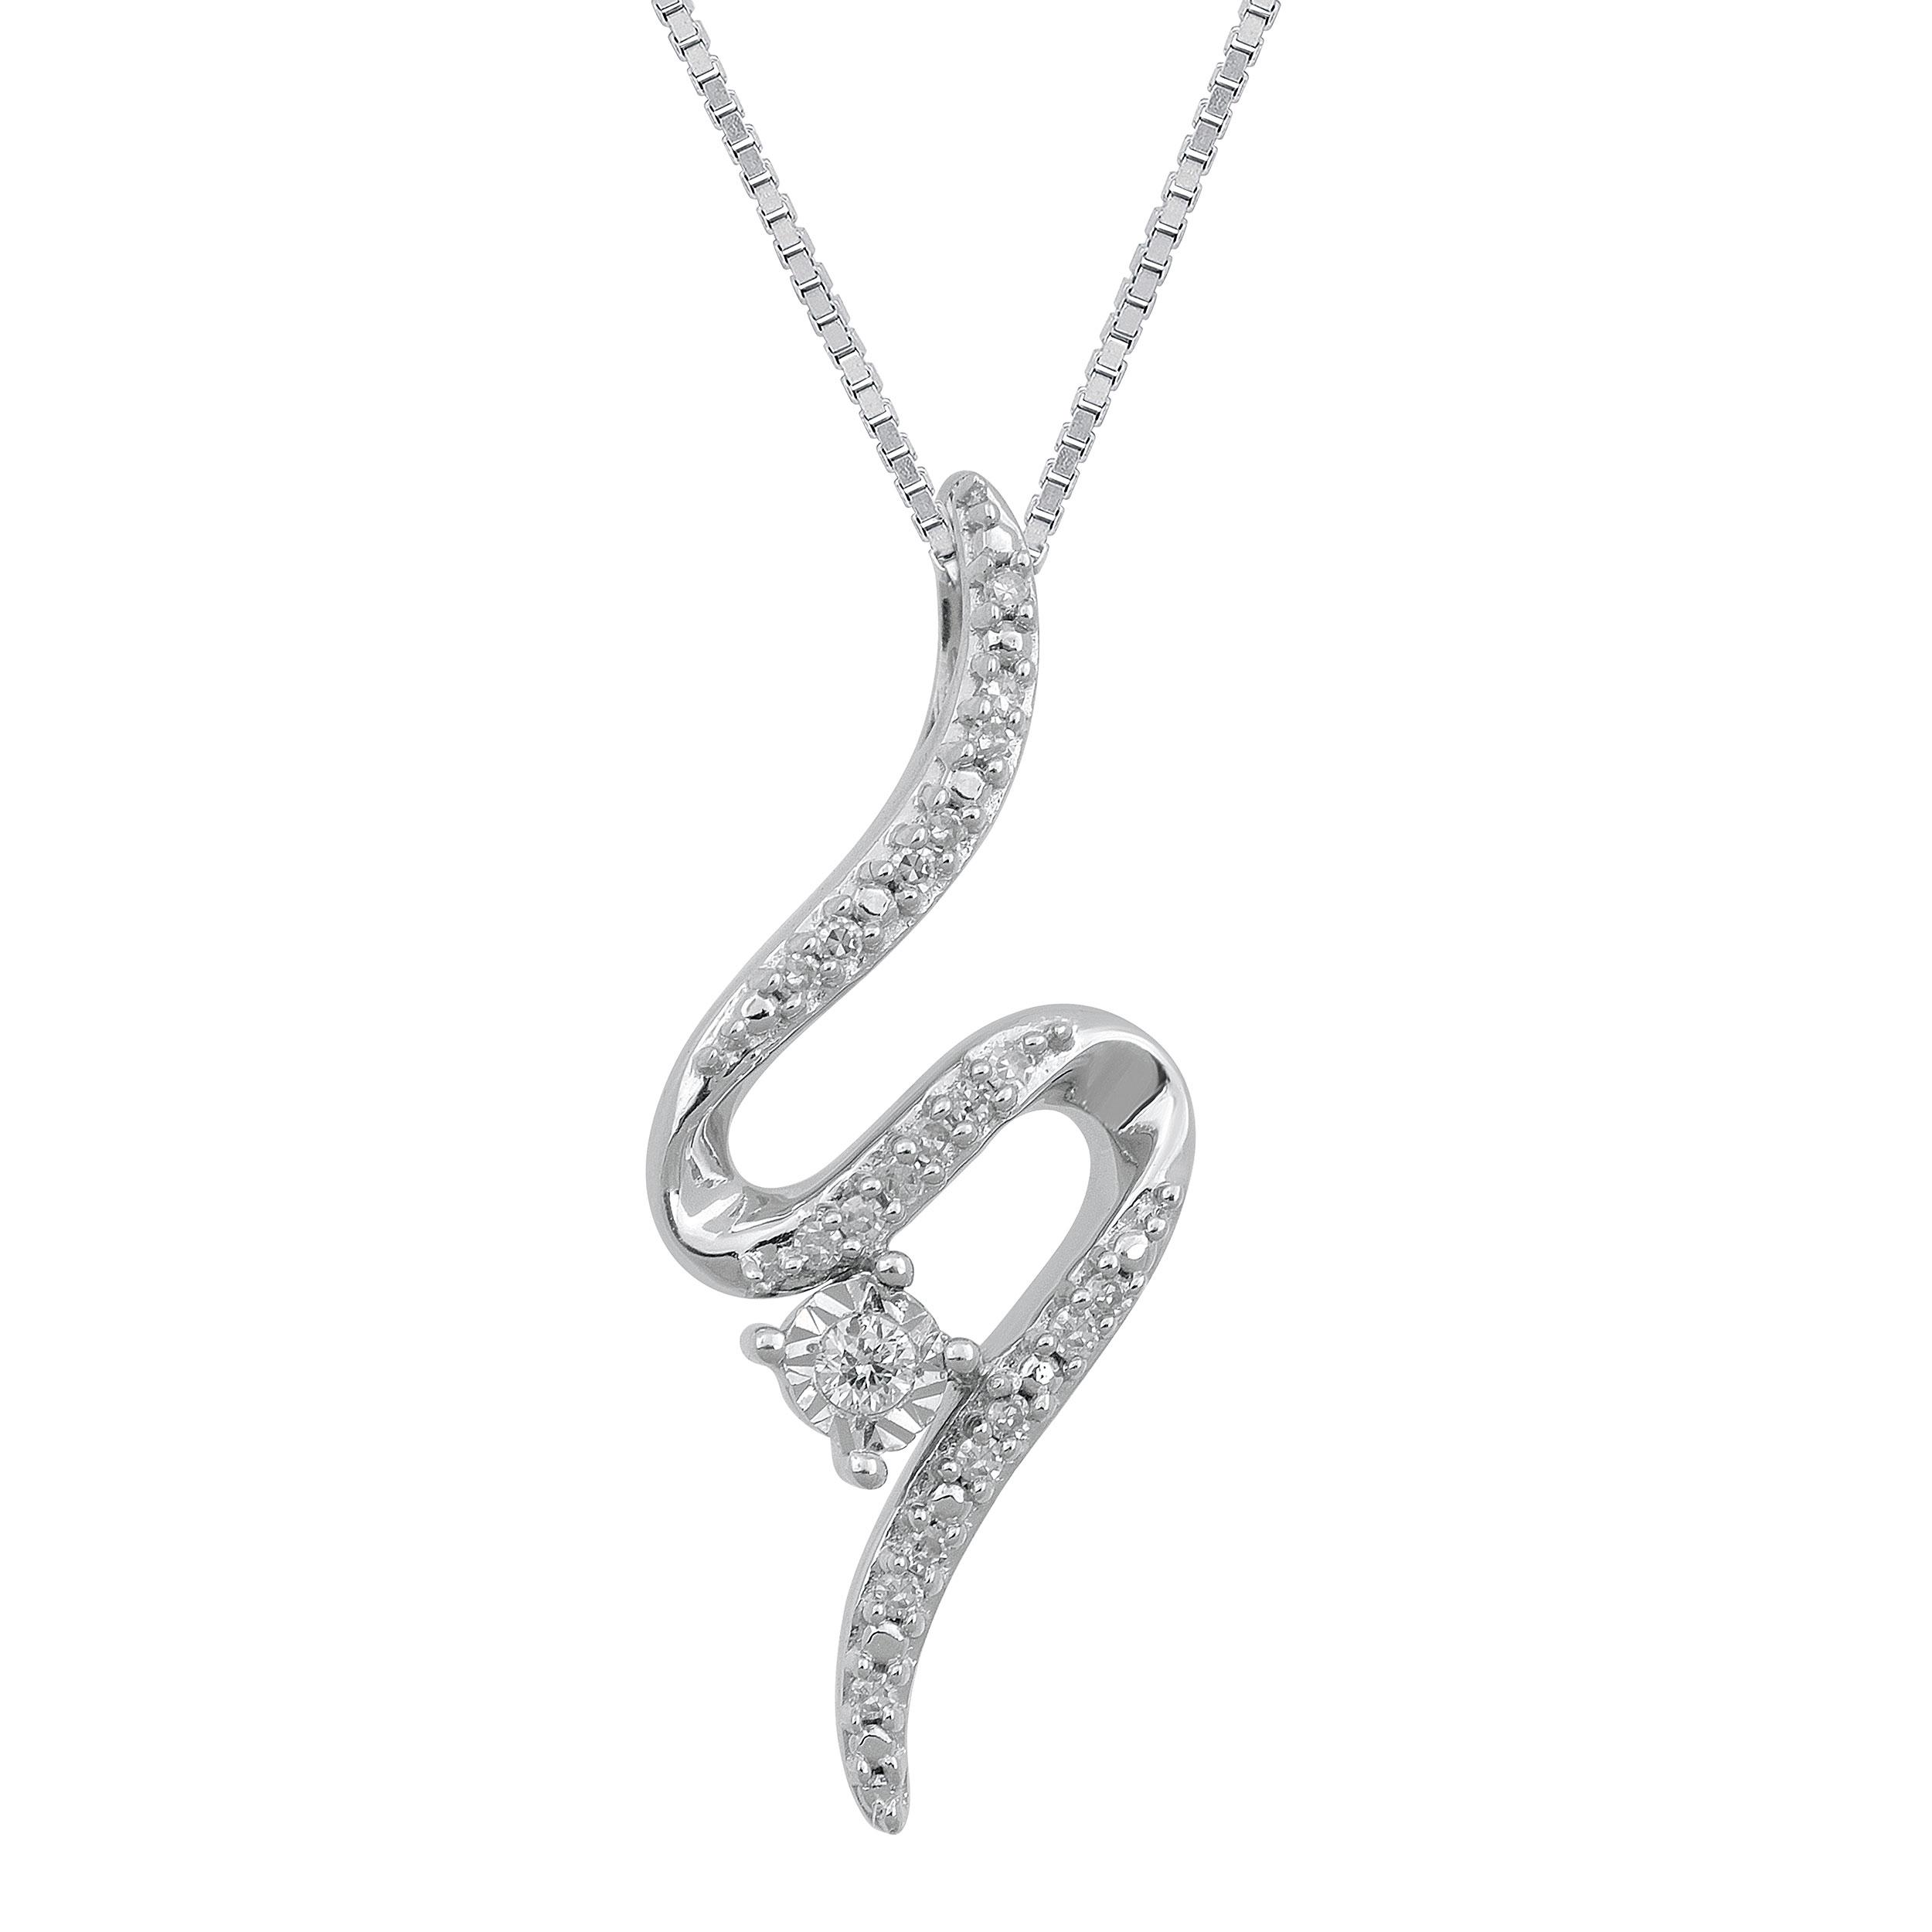 Open Hearts Road Ahead Diamond Necklace 1/4 ct tw 10K G